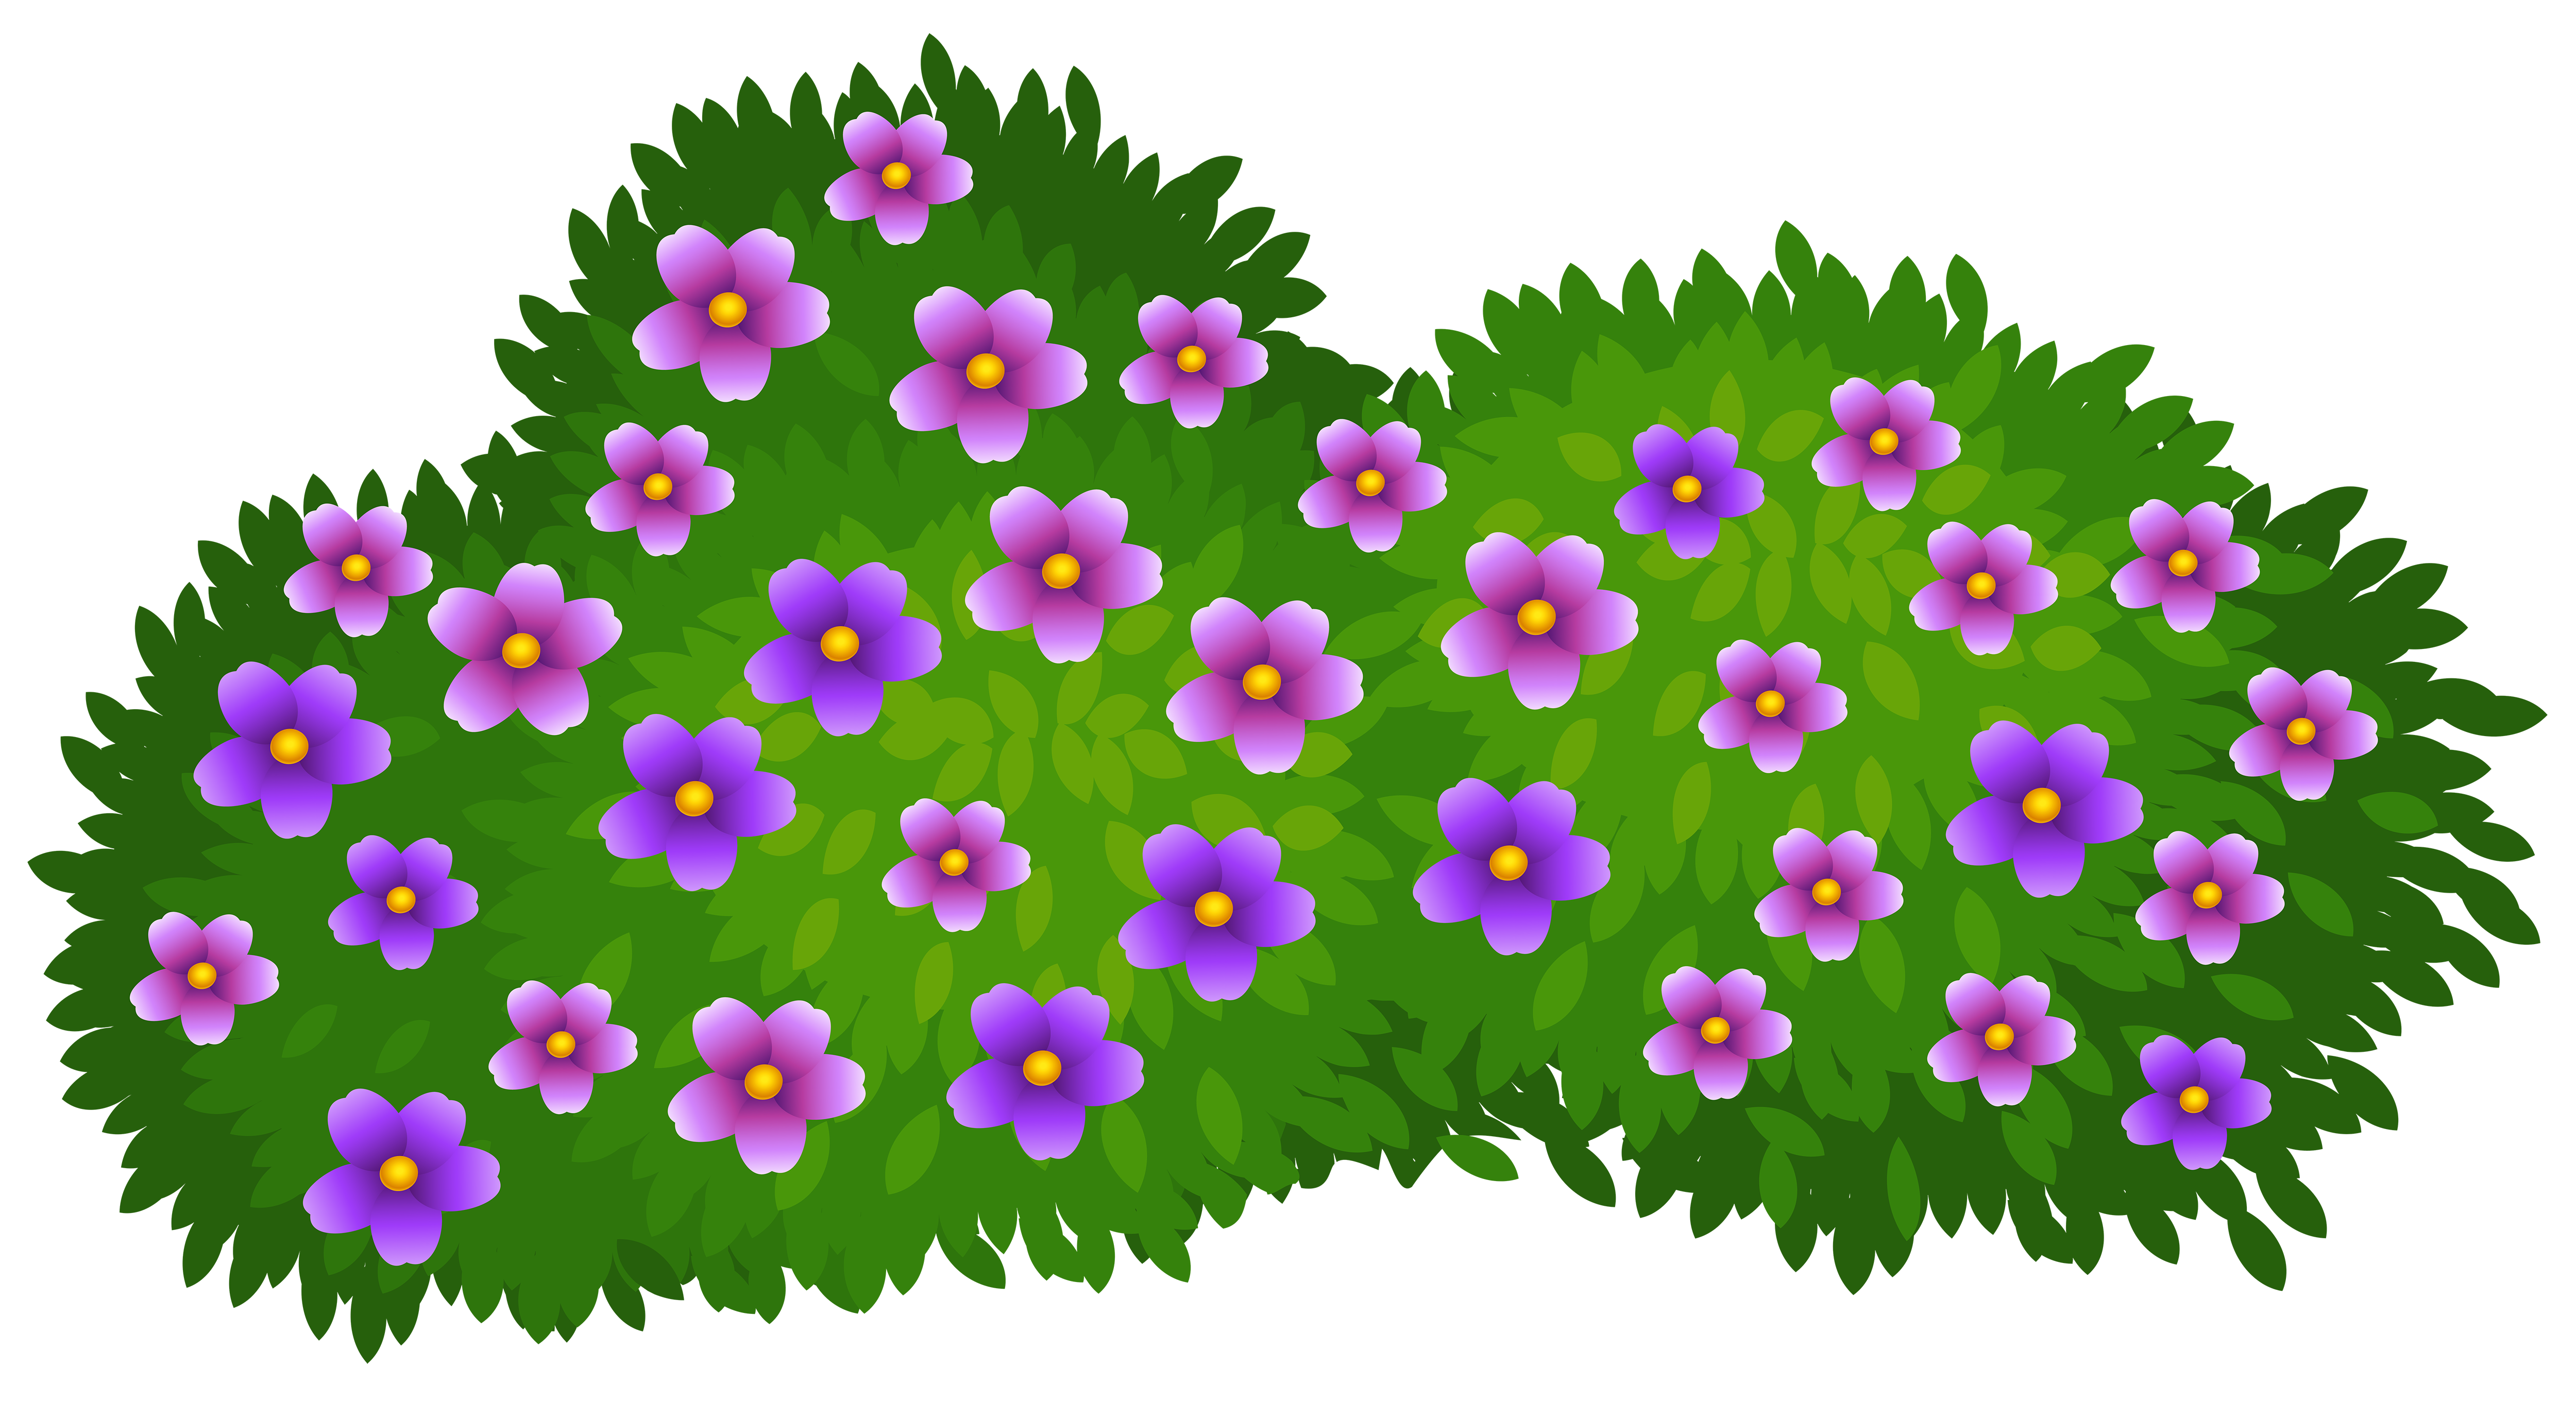 5000x2720 Green Bush With Flowers Transparent Png Clip Art Imageu200b Gallery